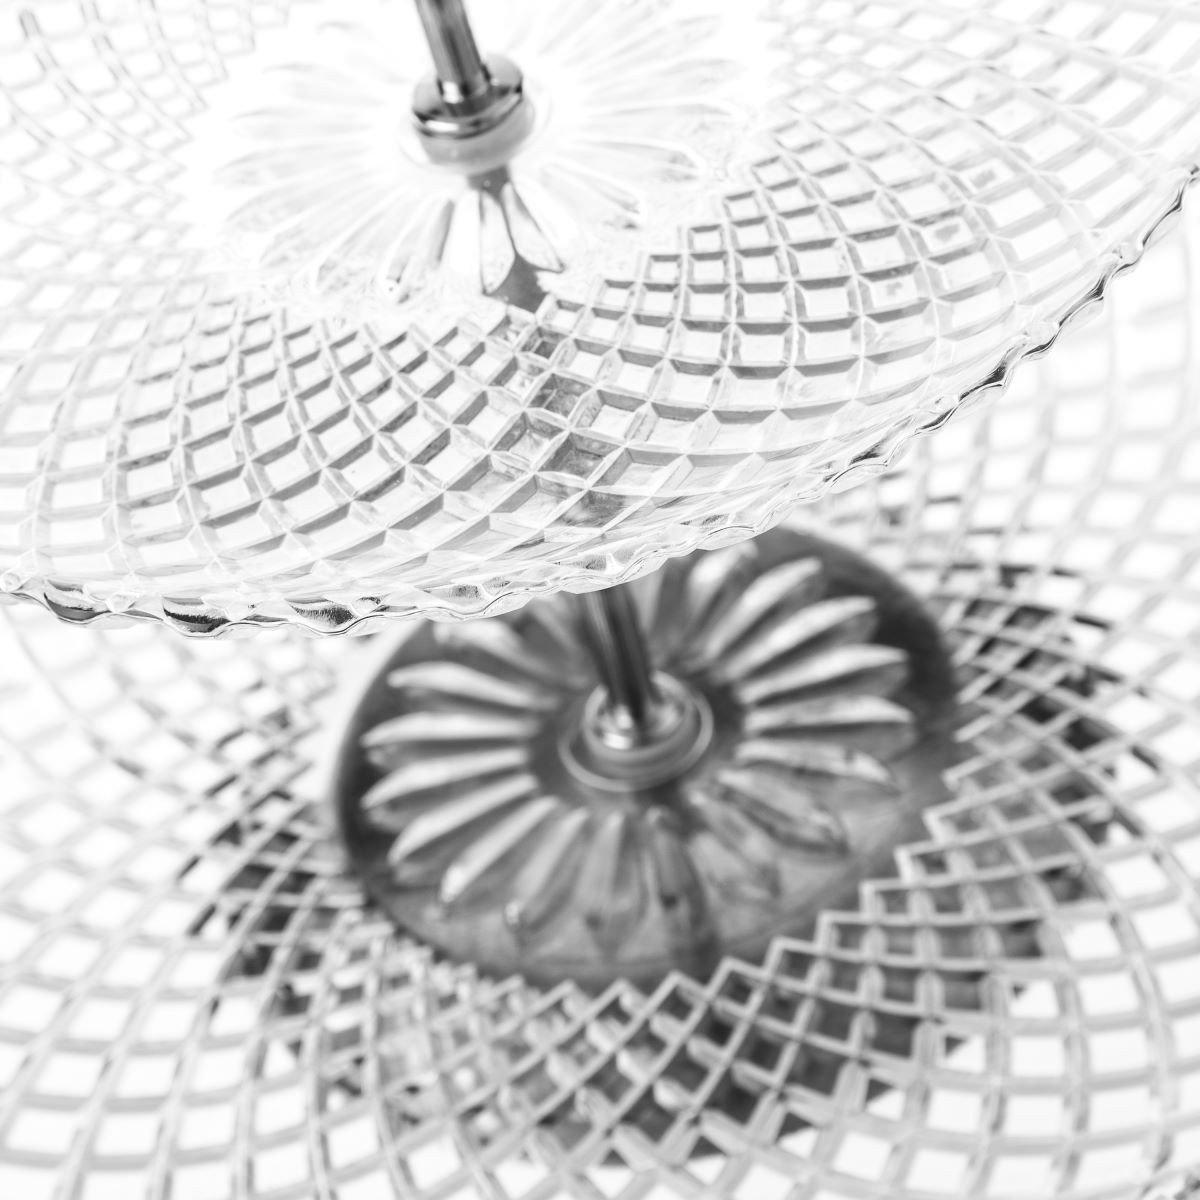 Dream Hogar Frutero//pastelero 2 Pisos Cristal 25x25x24 cm